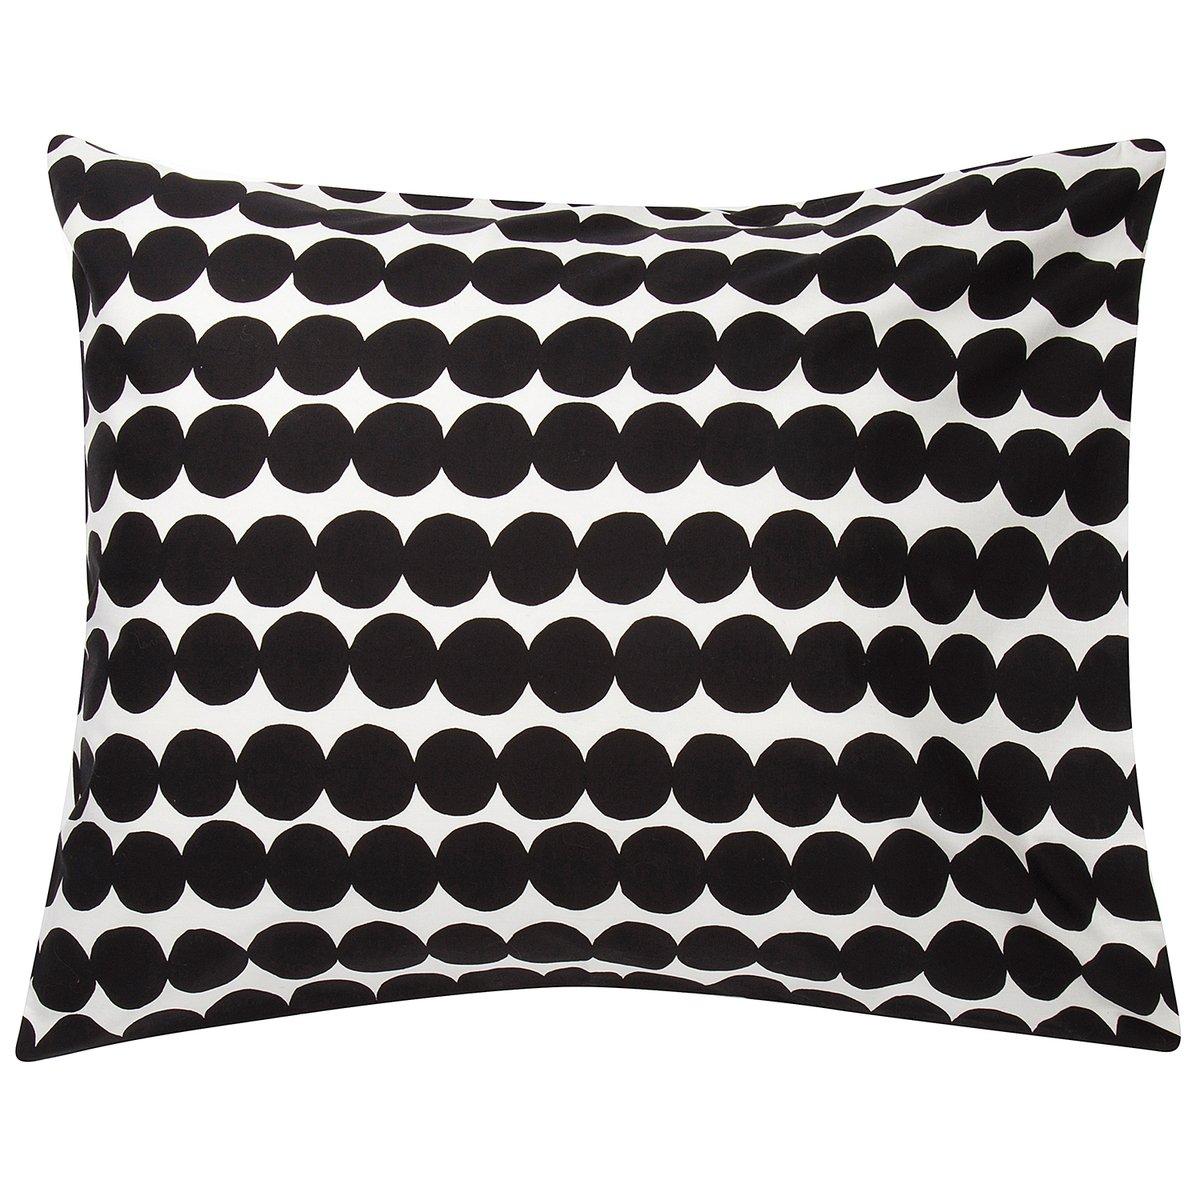 Marimekko Räsymatto Pillowcase, White - Black